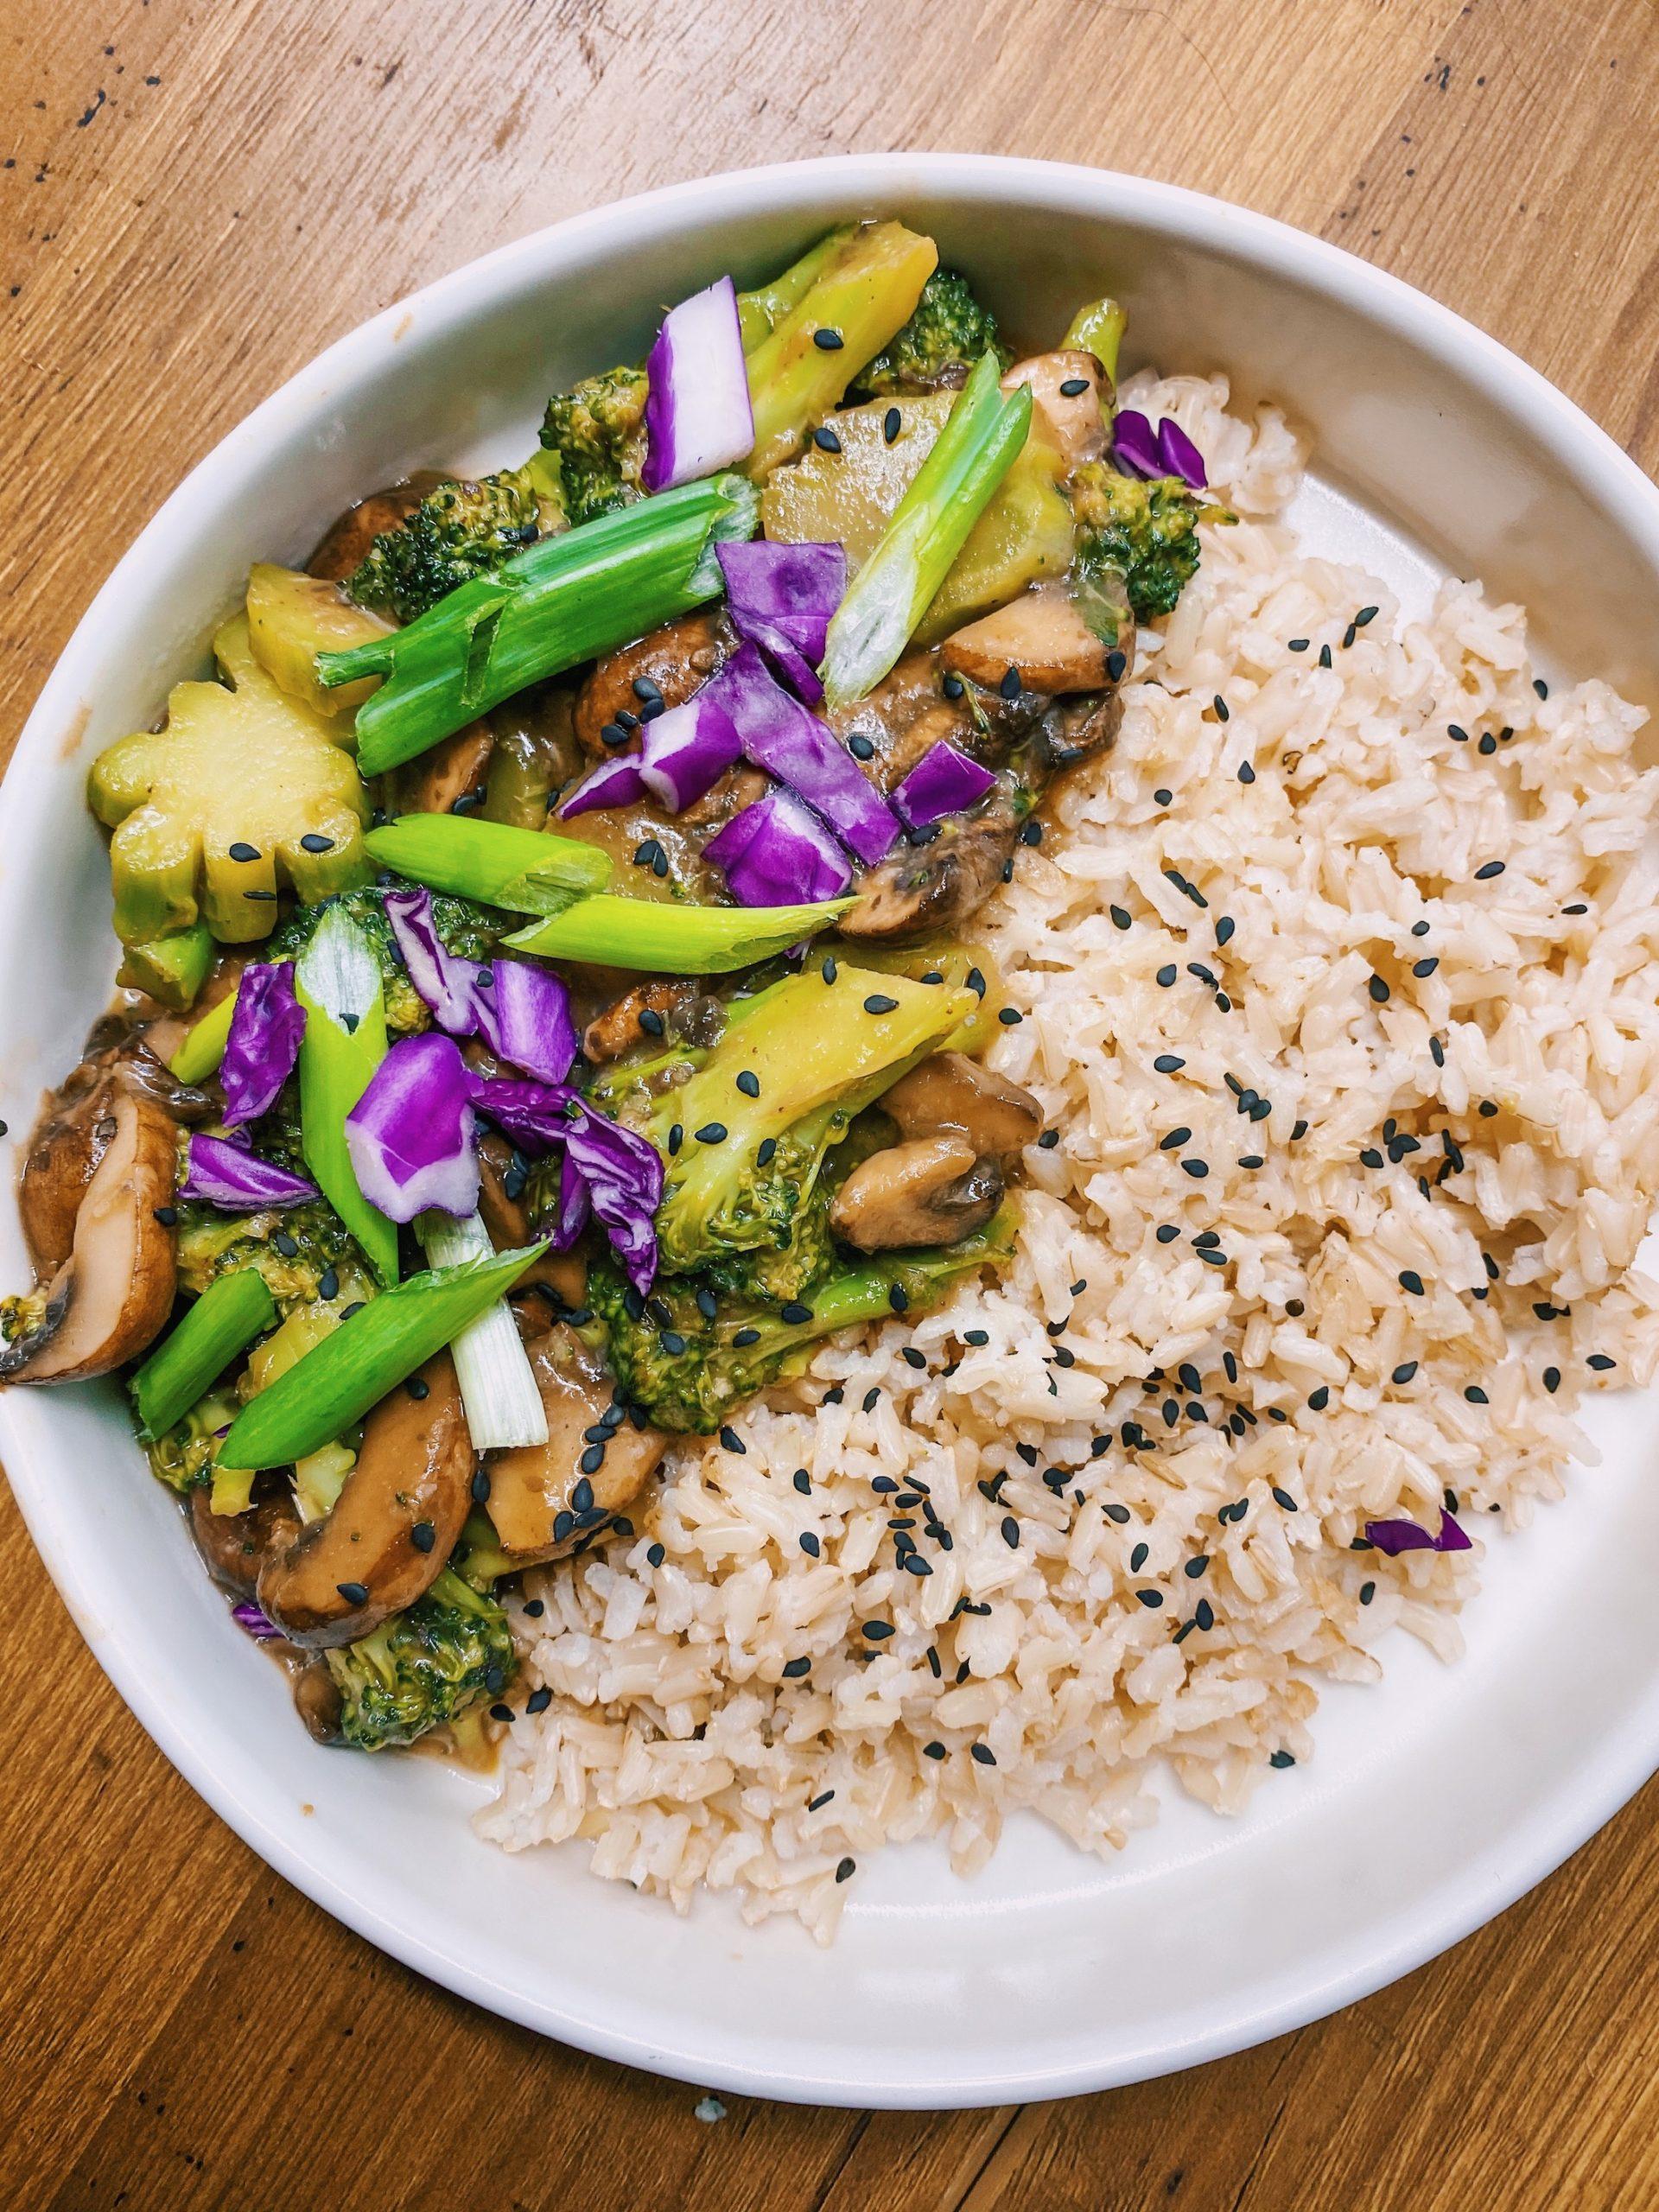 Broccoli Mushroom Stir Fry